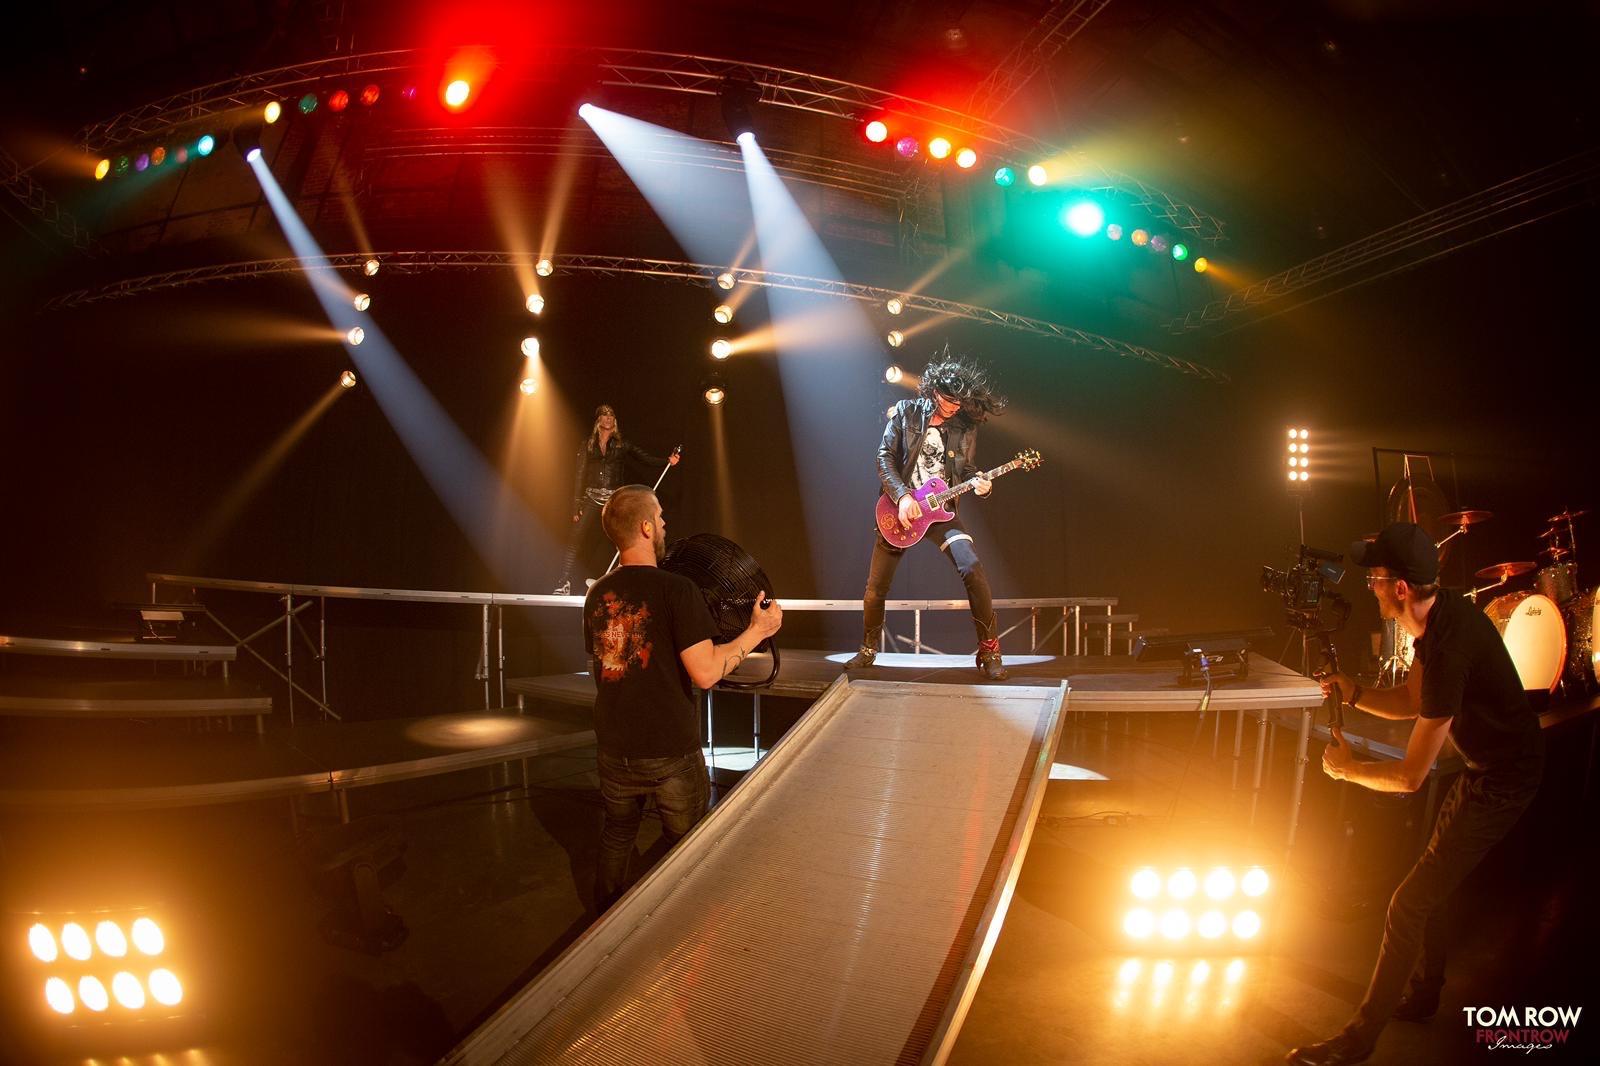 John Diva & the Rocket of Love Videodreh